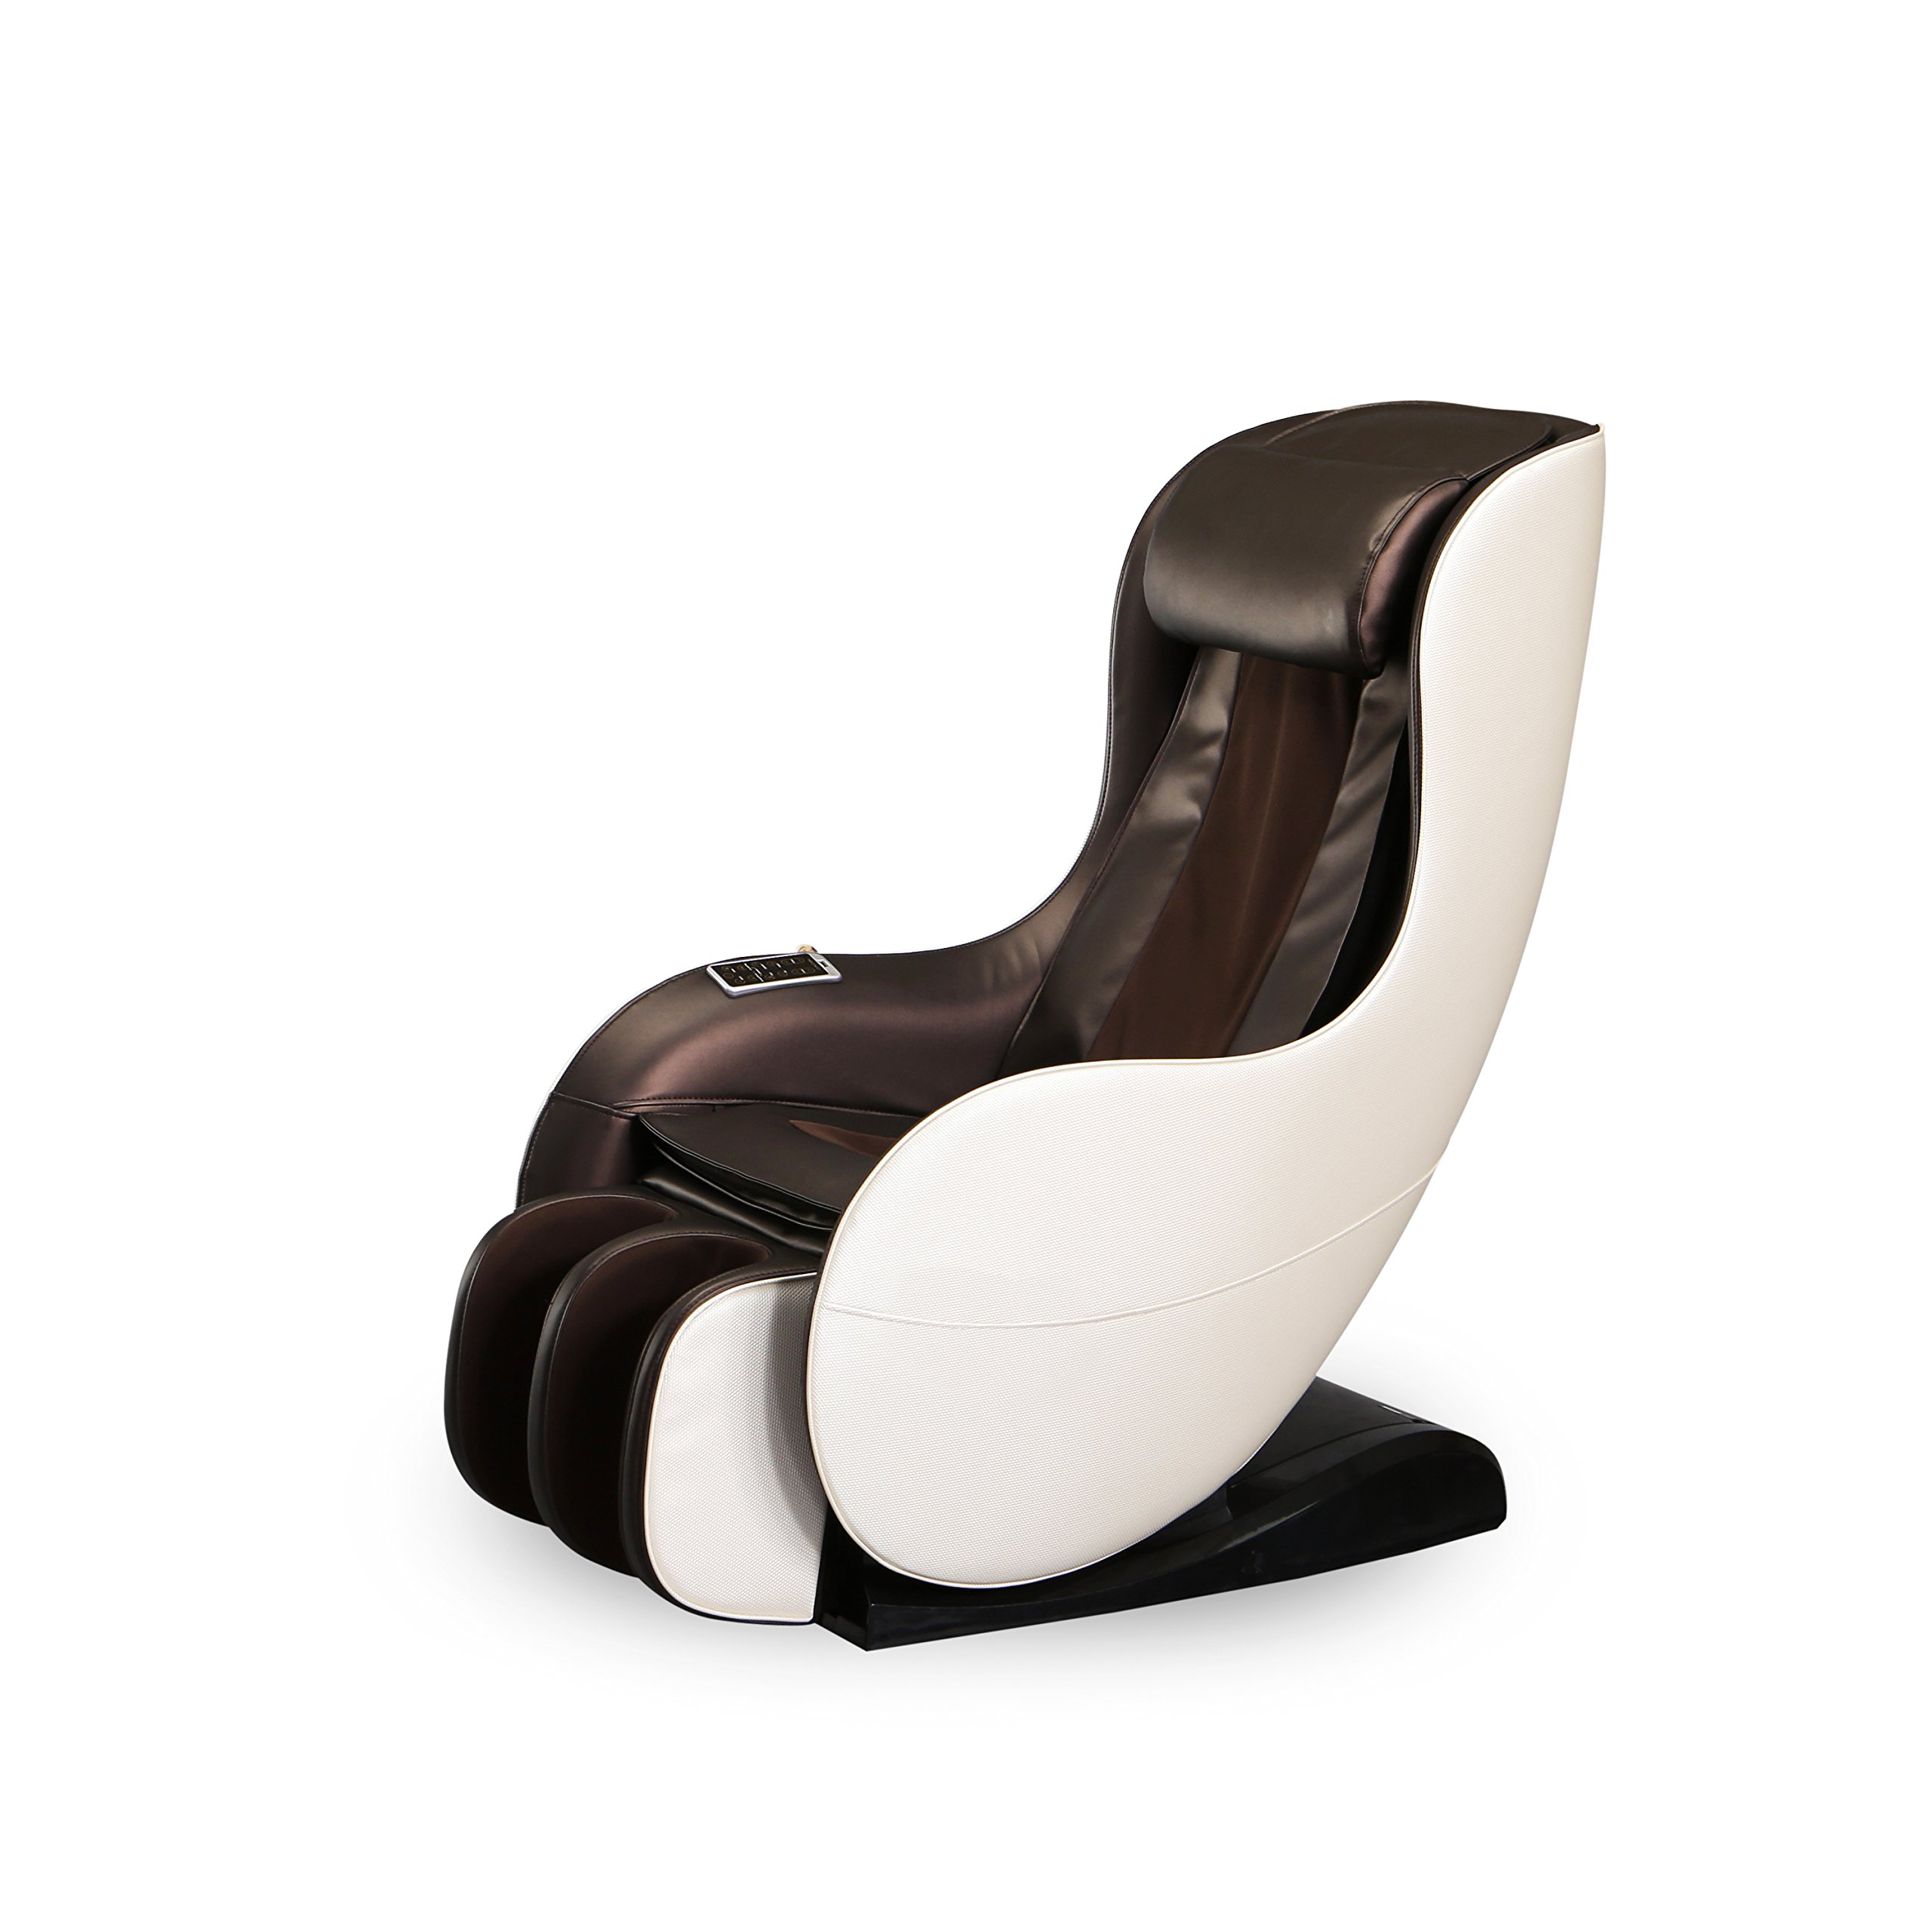 Zero Gravity Full Body Electric Shiatsu Massage Chair Recliner with Heat Therapy Warm Massaging Rollers Air Pressure Massage L-Track Stretch Wireless Bluetooth Speaker USB Charger,Cream